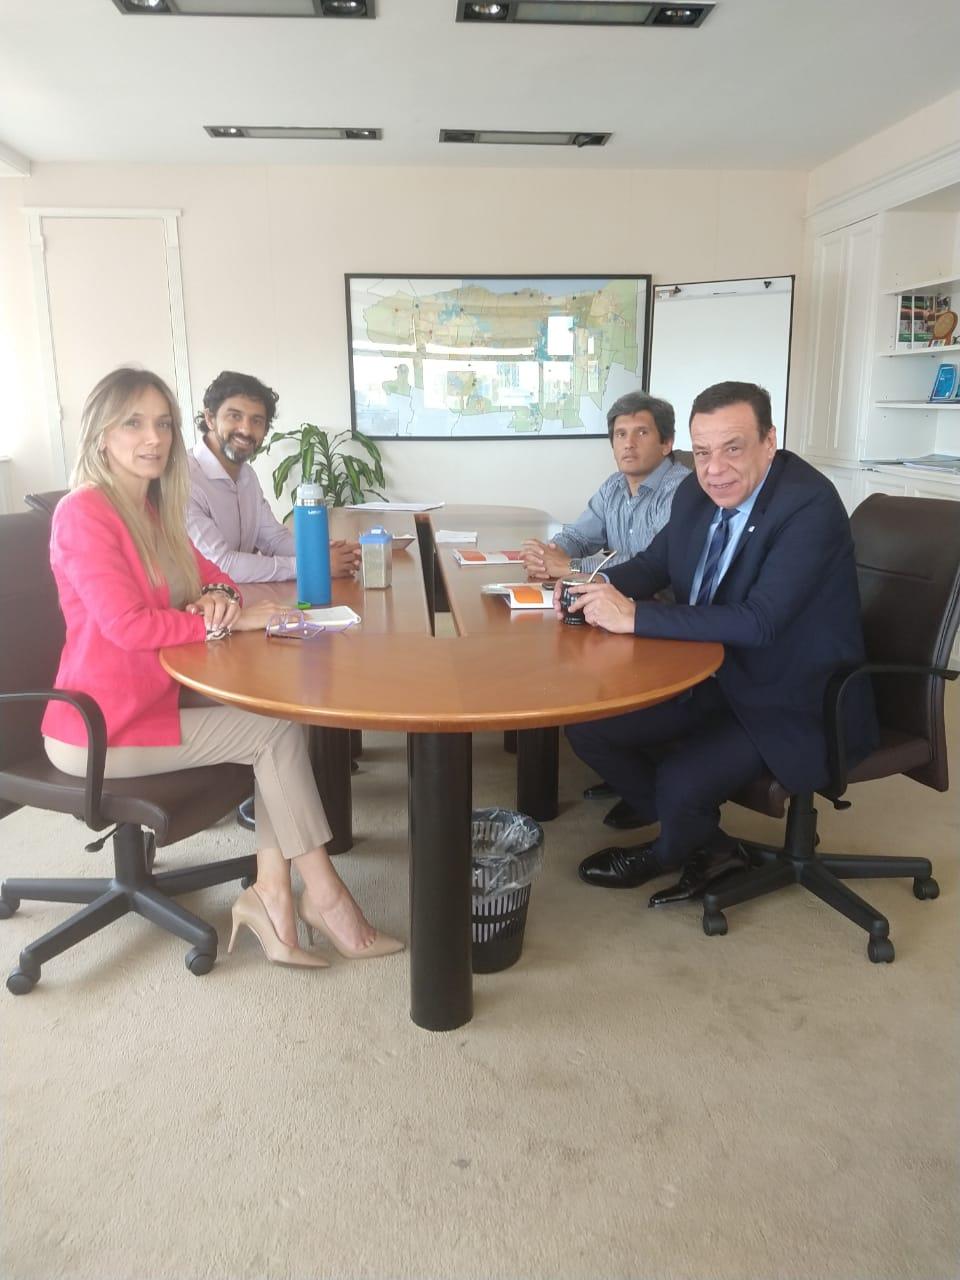 El Intendente Caffaro se reunió con la Presidenta de AySA Malena Galmarini